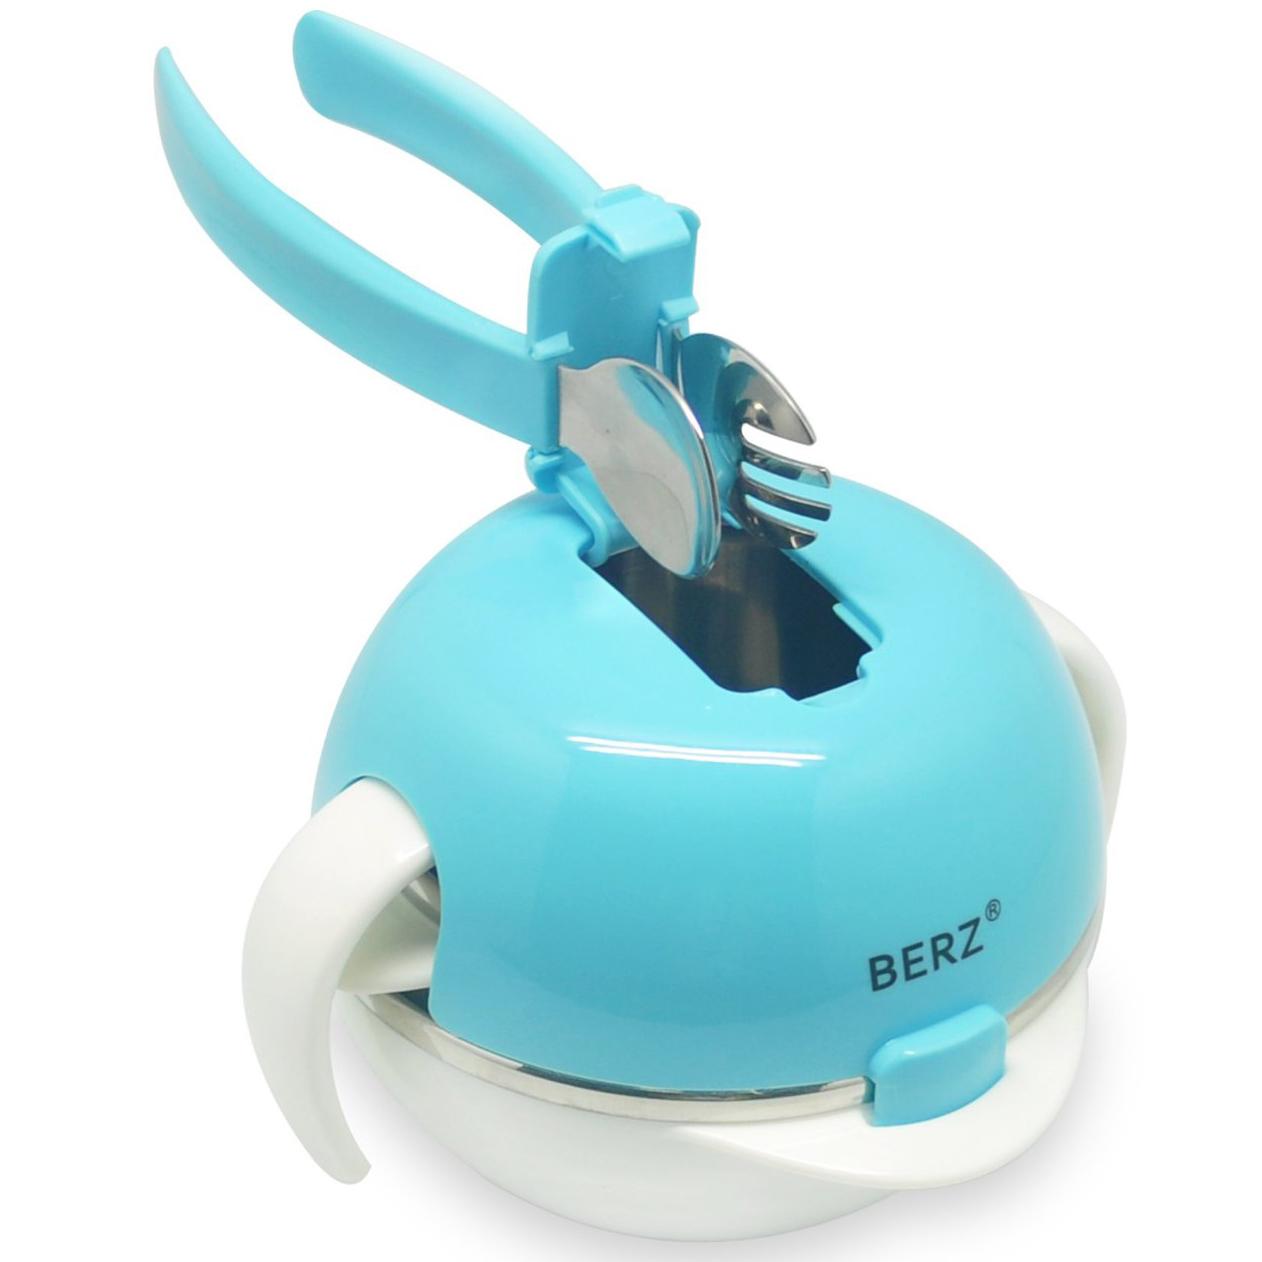 Berz Baby 12m+ Dinnerware Bunny5-in-1Βρεφικό Σετ Φαγητού σε Διάφορα Χρώματα -  μητέρα παιδί   αξεσουάρ και παιχνίδια   βρεφικά   παιδικά σετάκια φαγητού